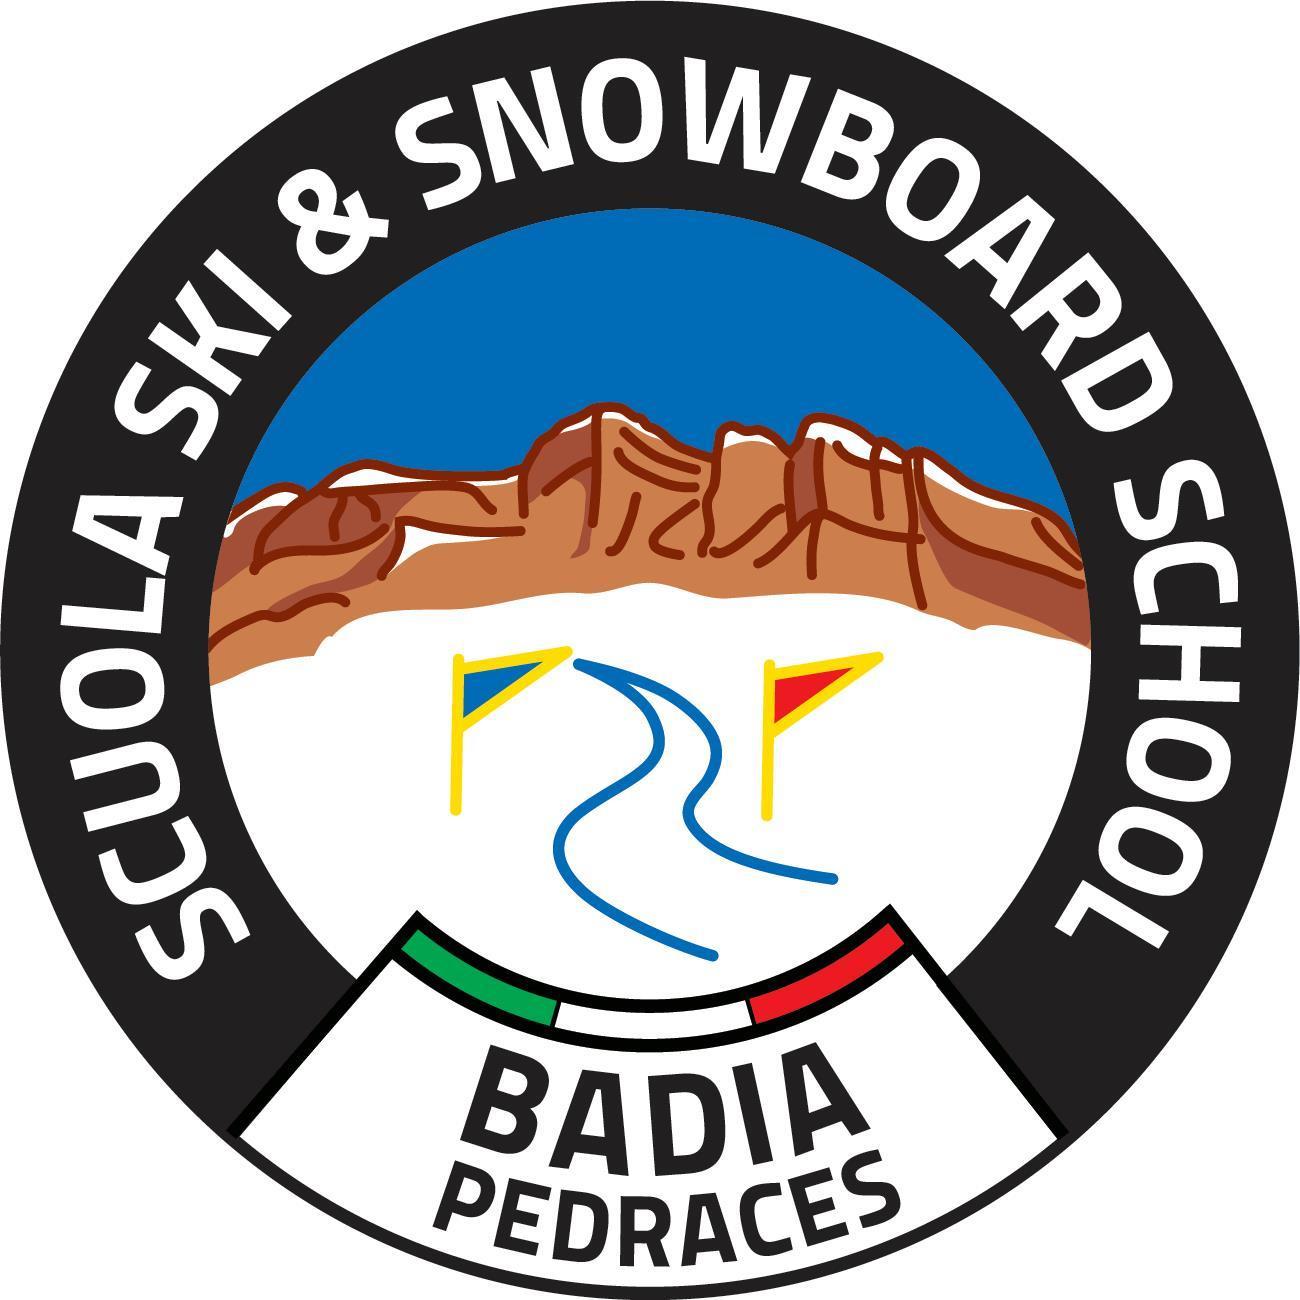 Ski- und Snowboardschule Badia Pedraces